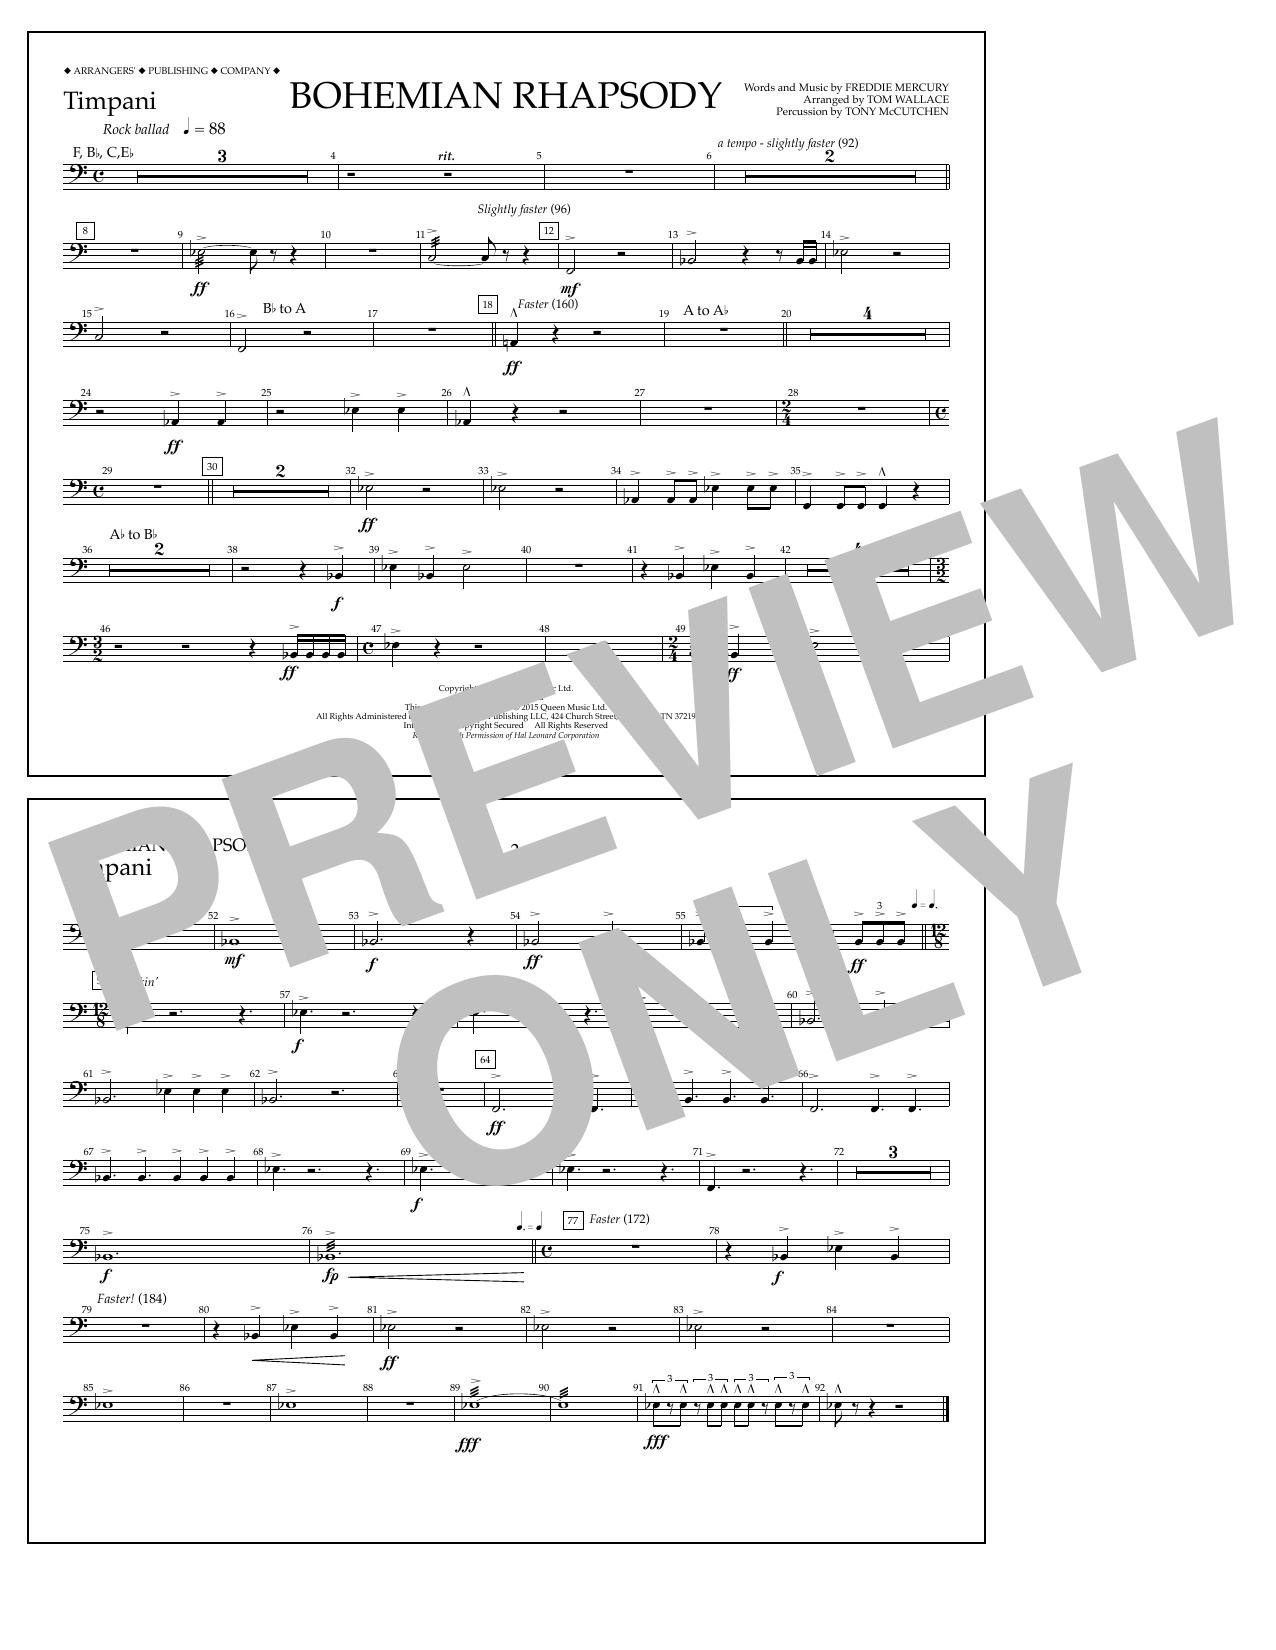 Tom Wallace Bohemian Rhapsody - Timpani sheet music notes and chords. Download Printable PDF.